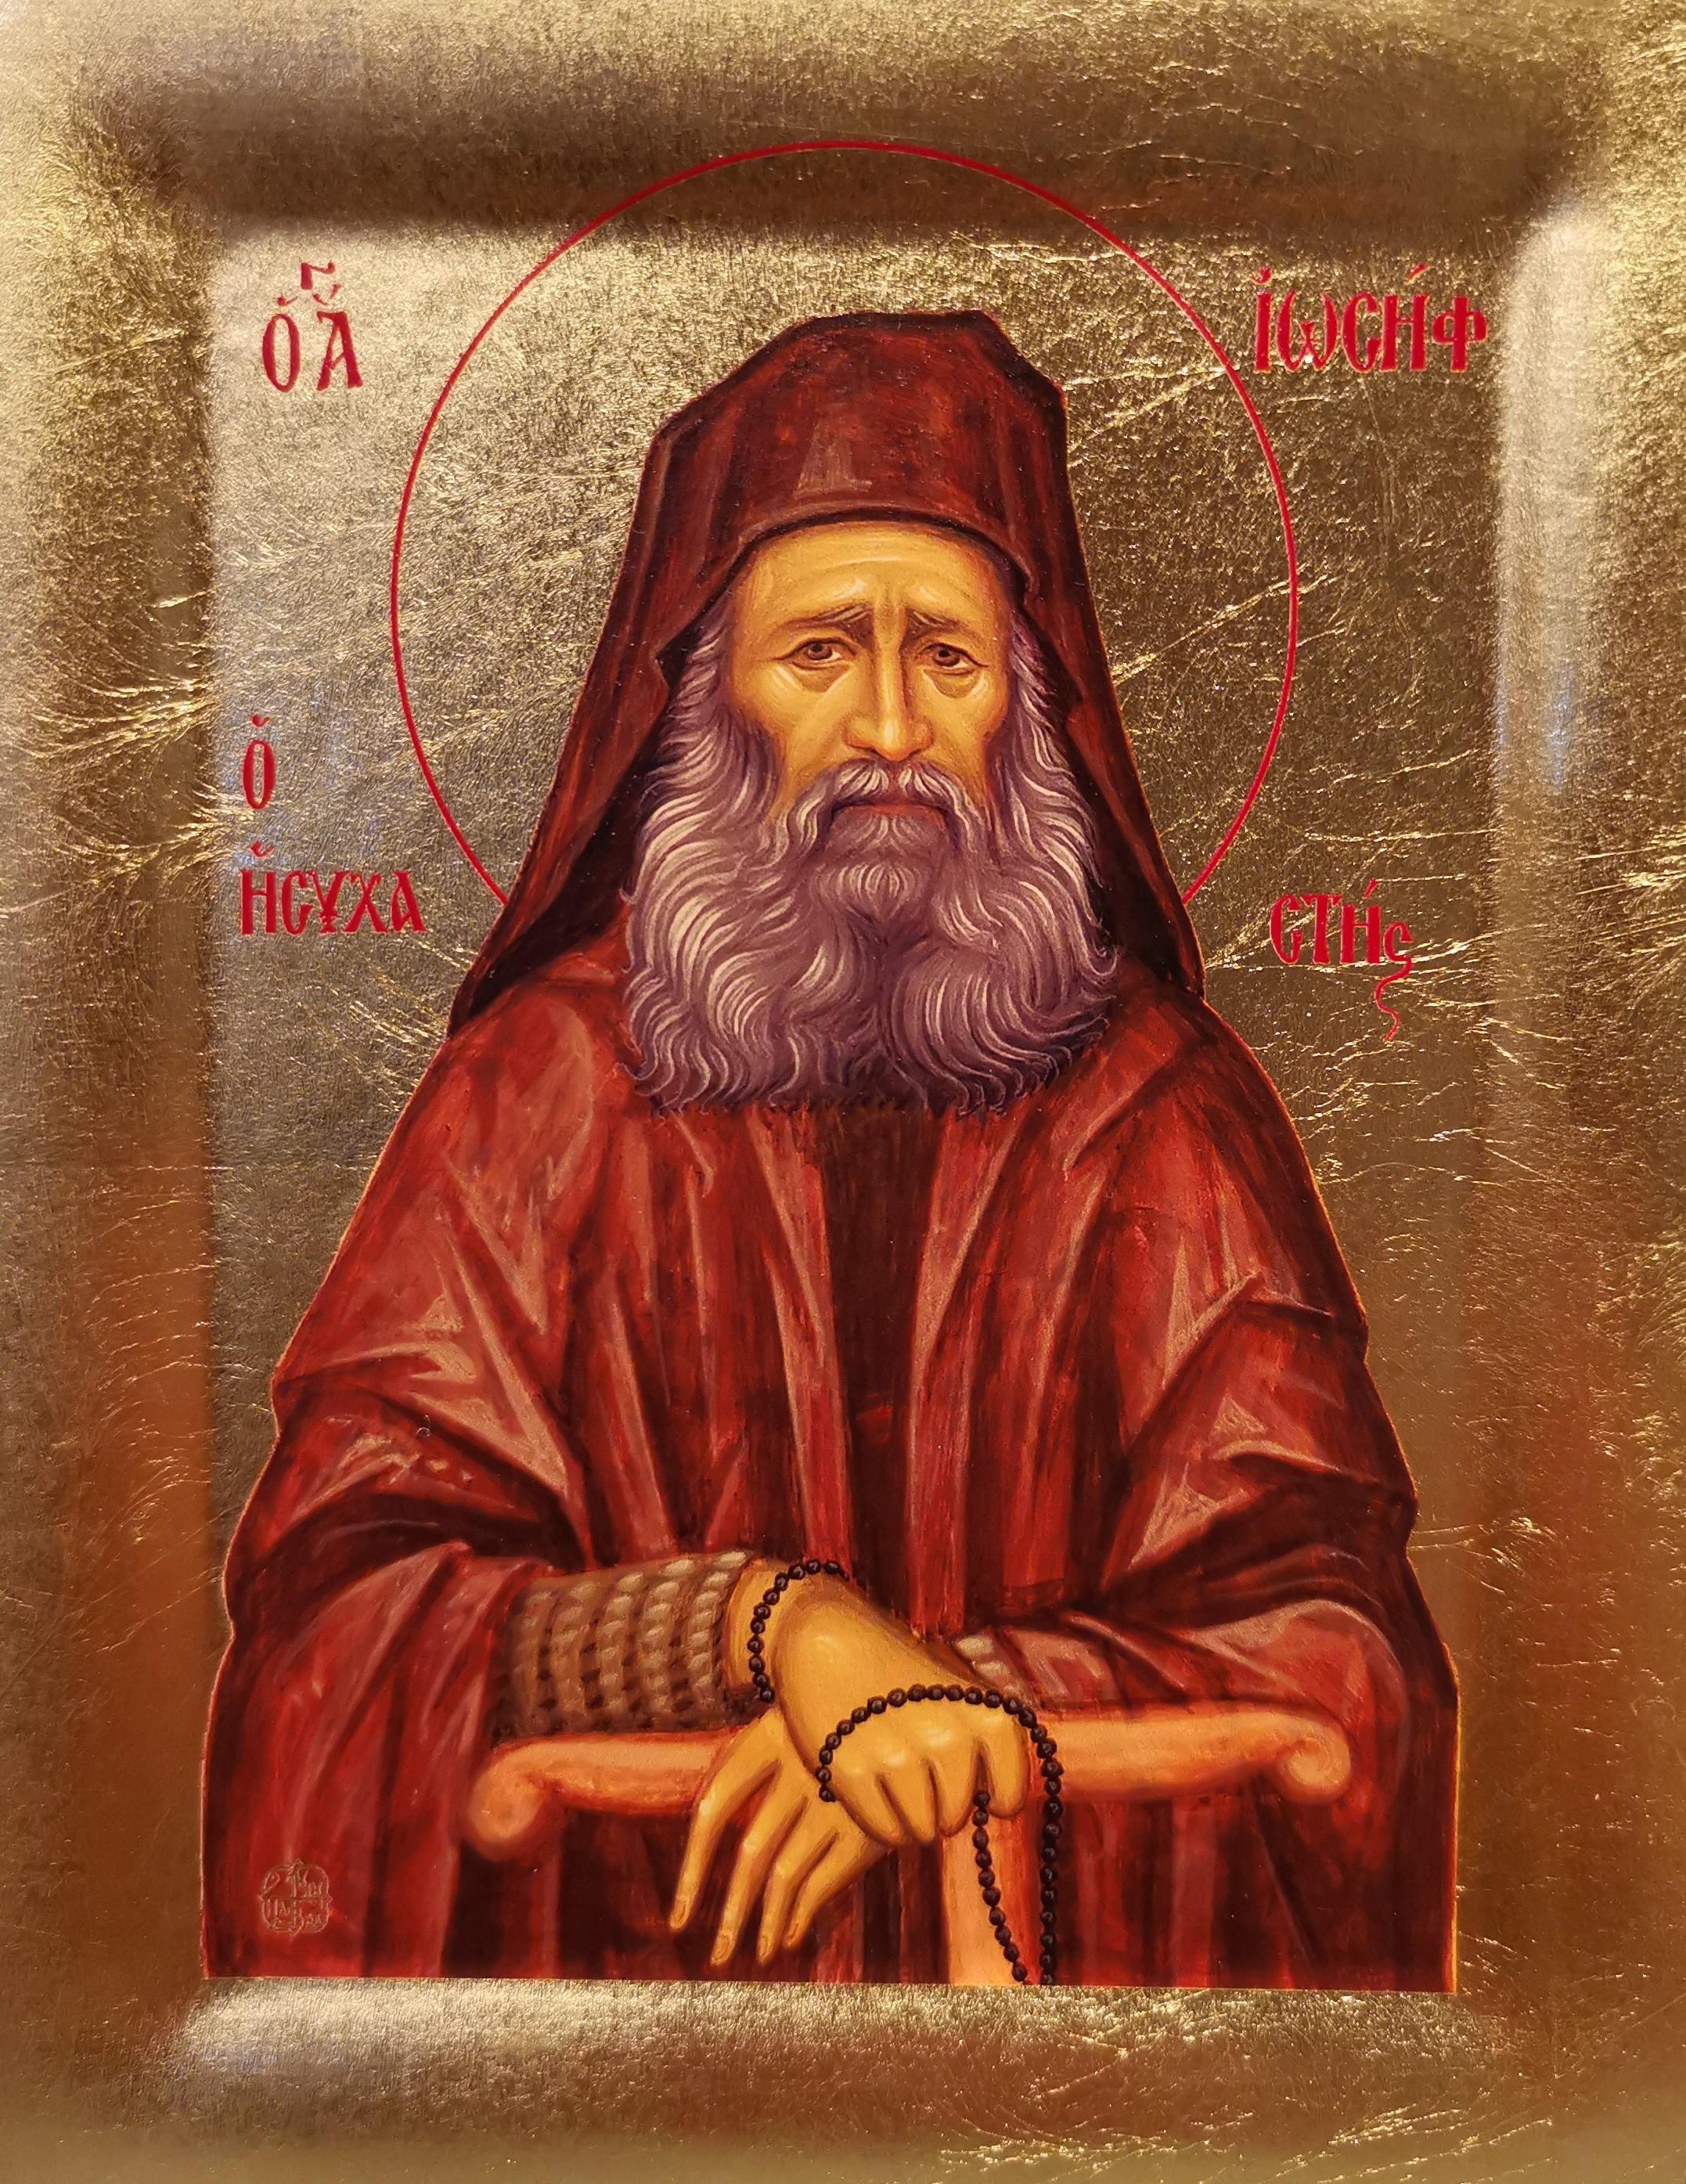 Icoana Sfantul Cuvios Iosif Isihastul - Icoana cu foita de aur si matase, pe lemn (reproducere)